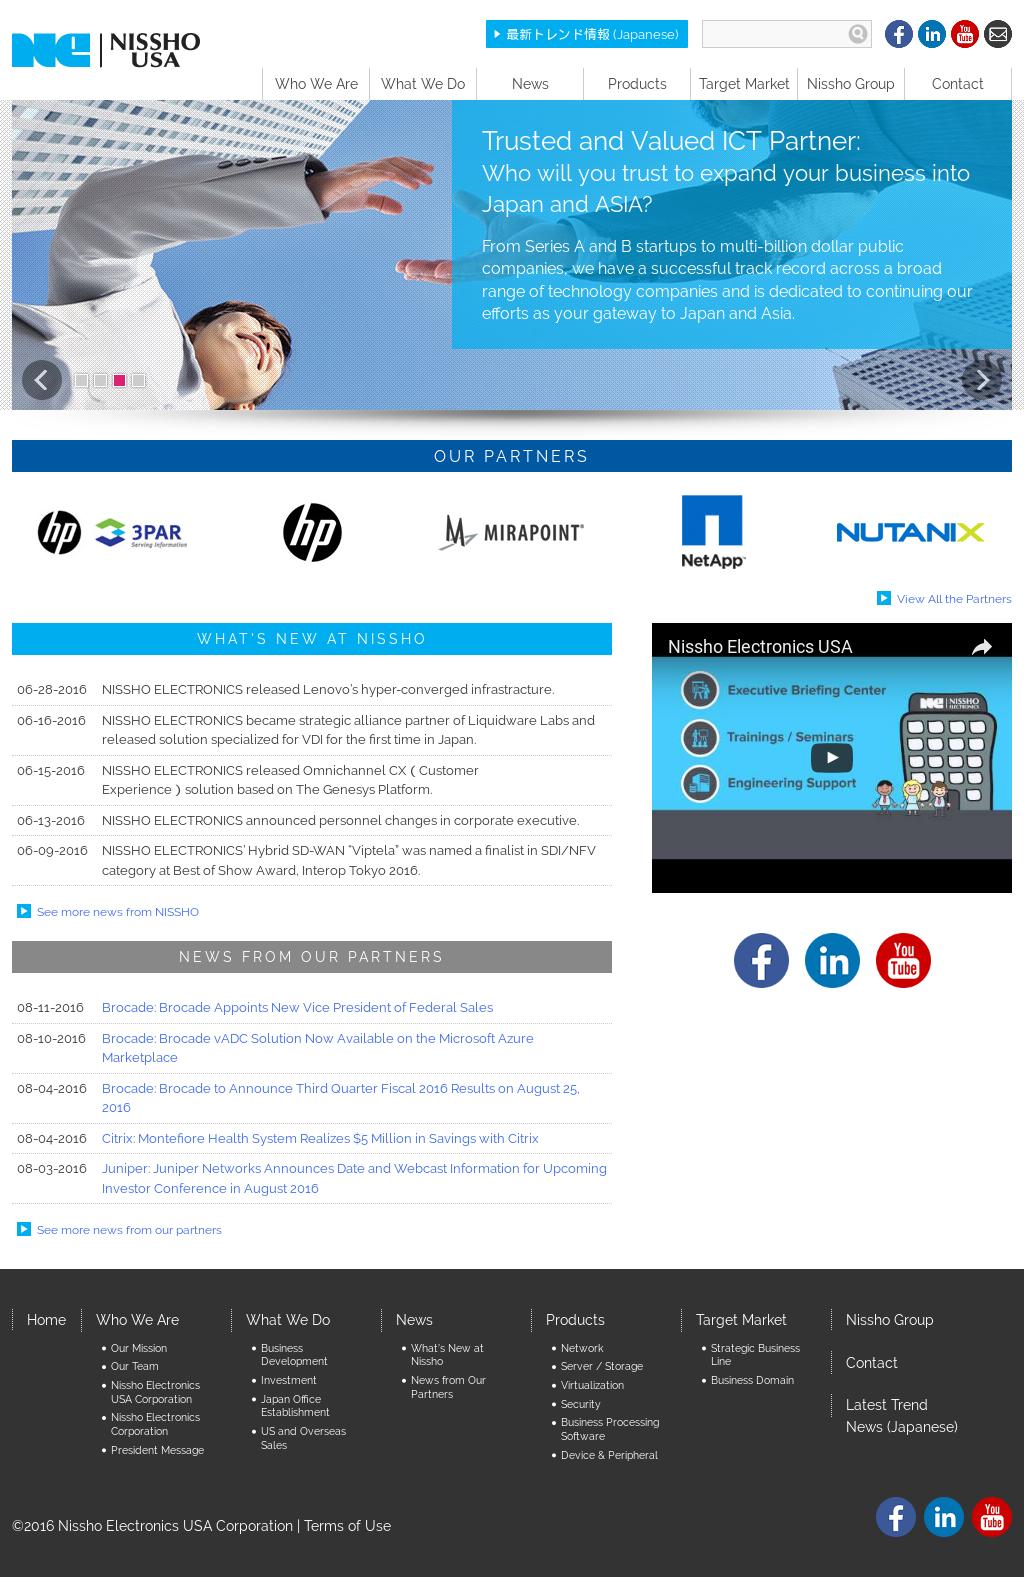 Nelco Competitors, Revenue and Employees - Owler Company Profile